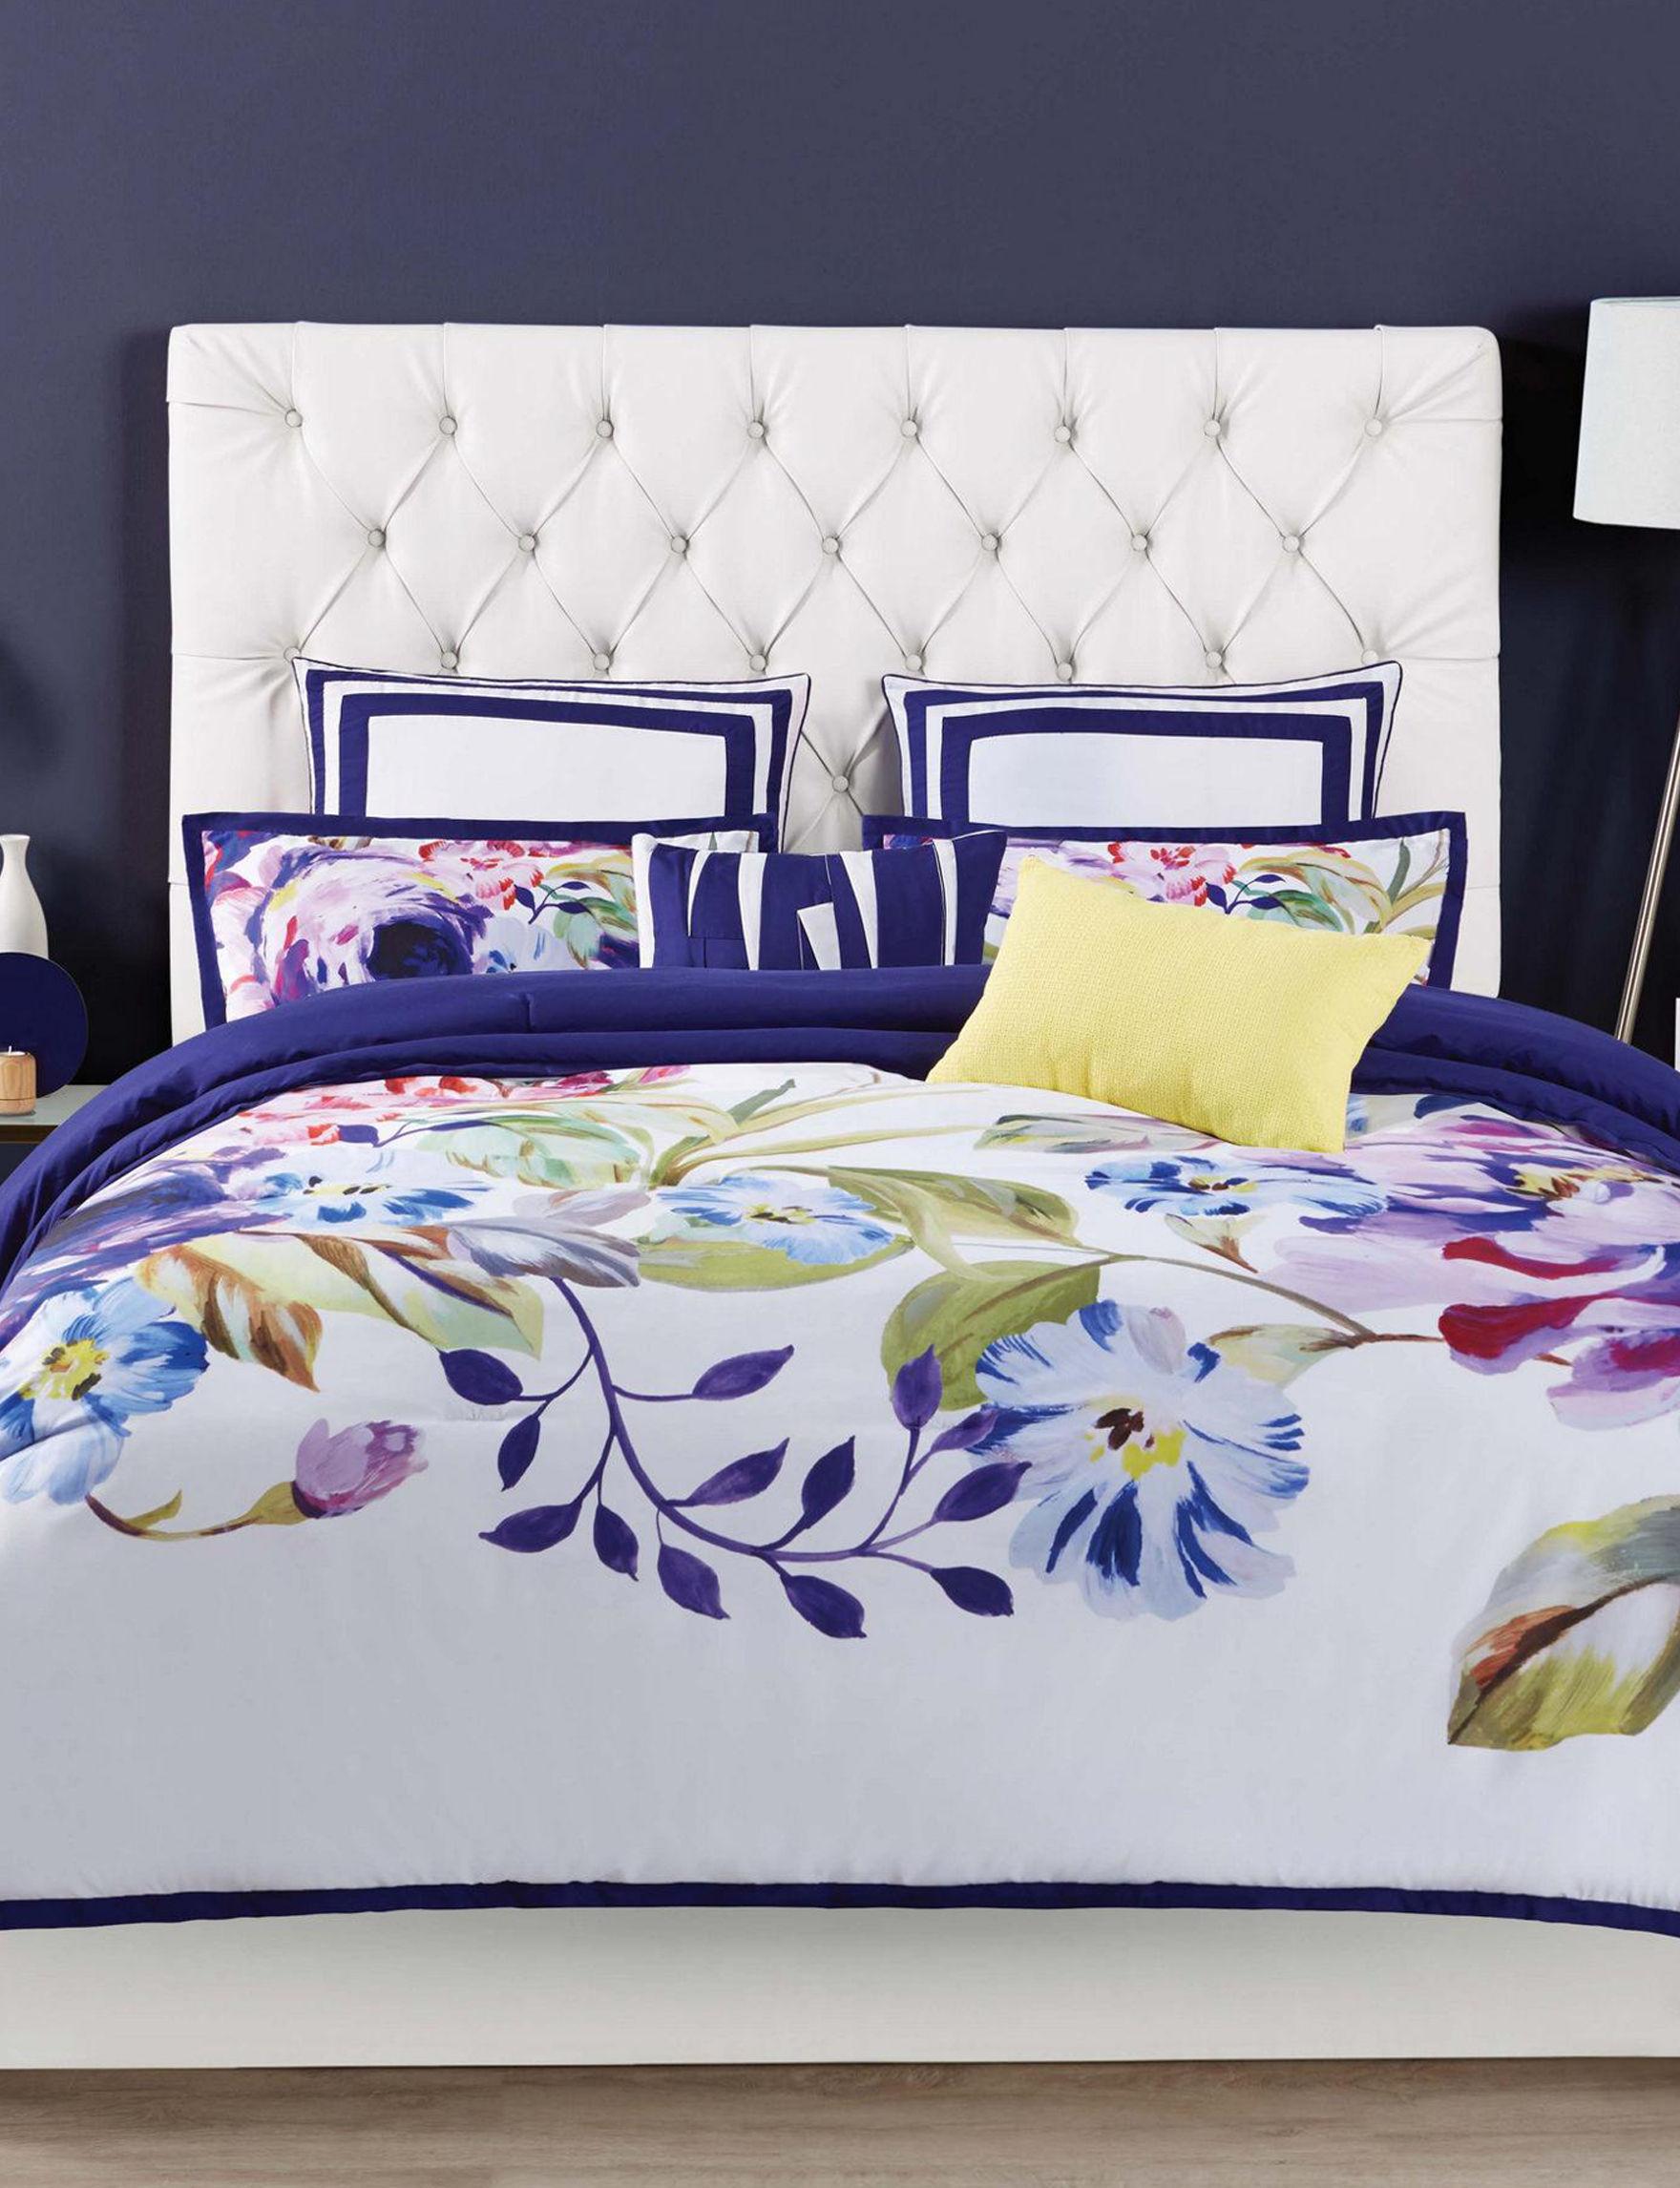 Christian Siriano New York White Decorative Pillows